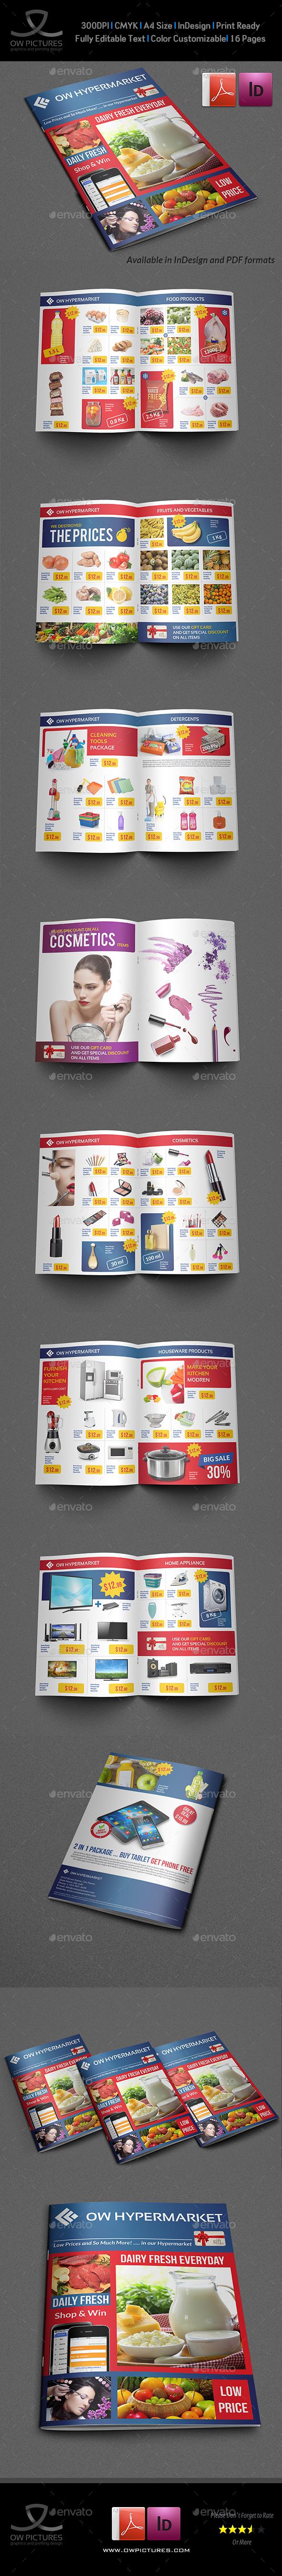 Supermarket Products Catalog Brochure Template Vol2 - Catalogs Brochures